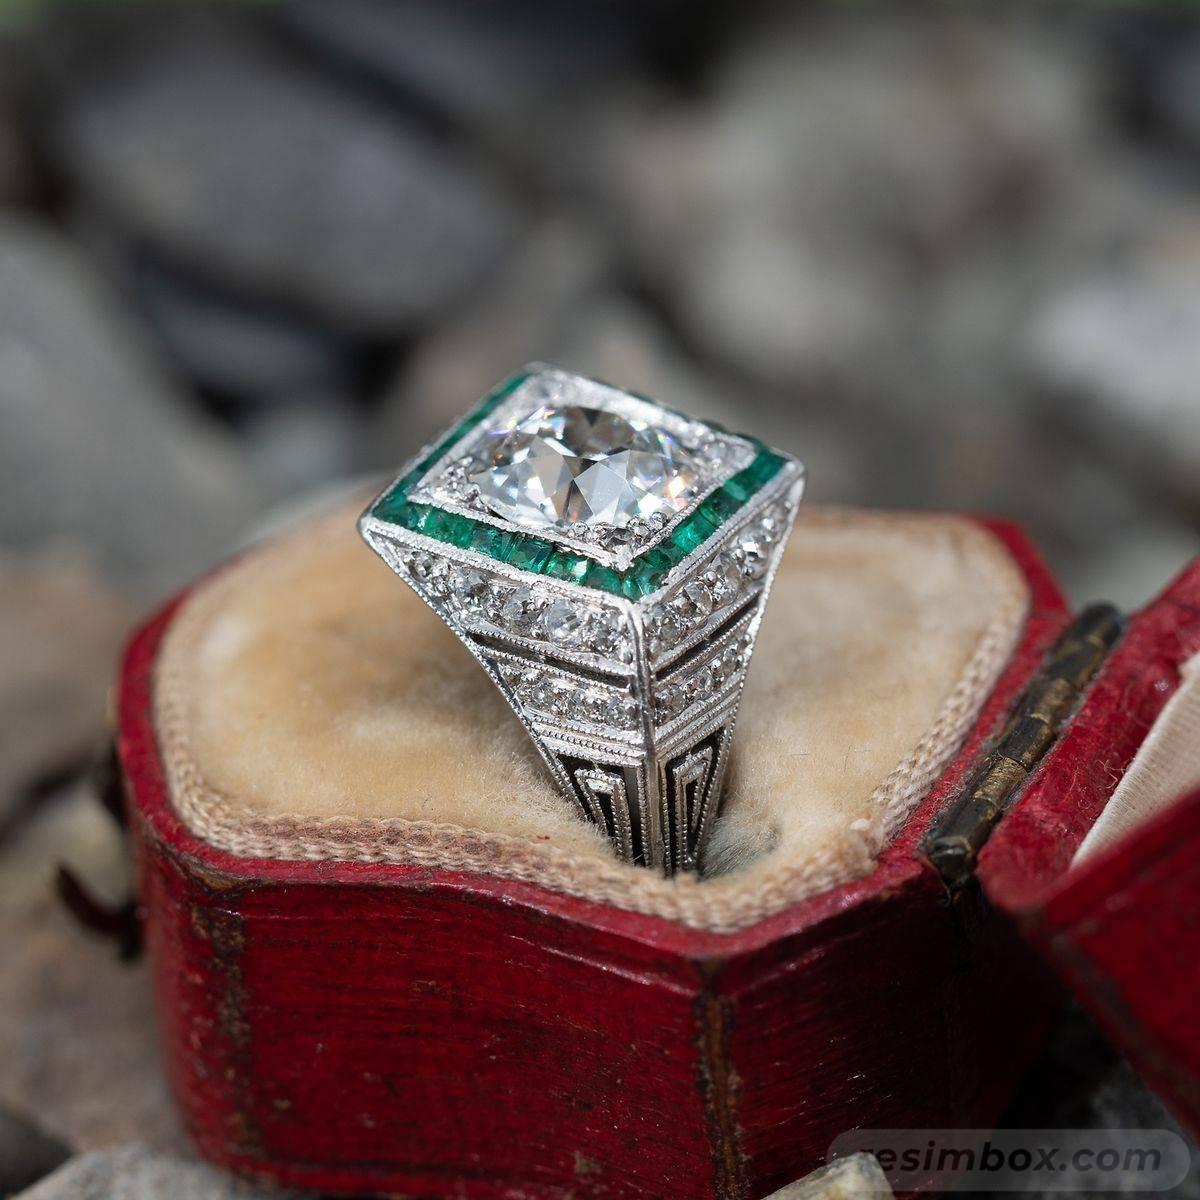 Art deco engagement ring-78109374774010021